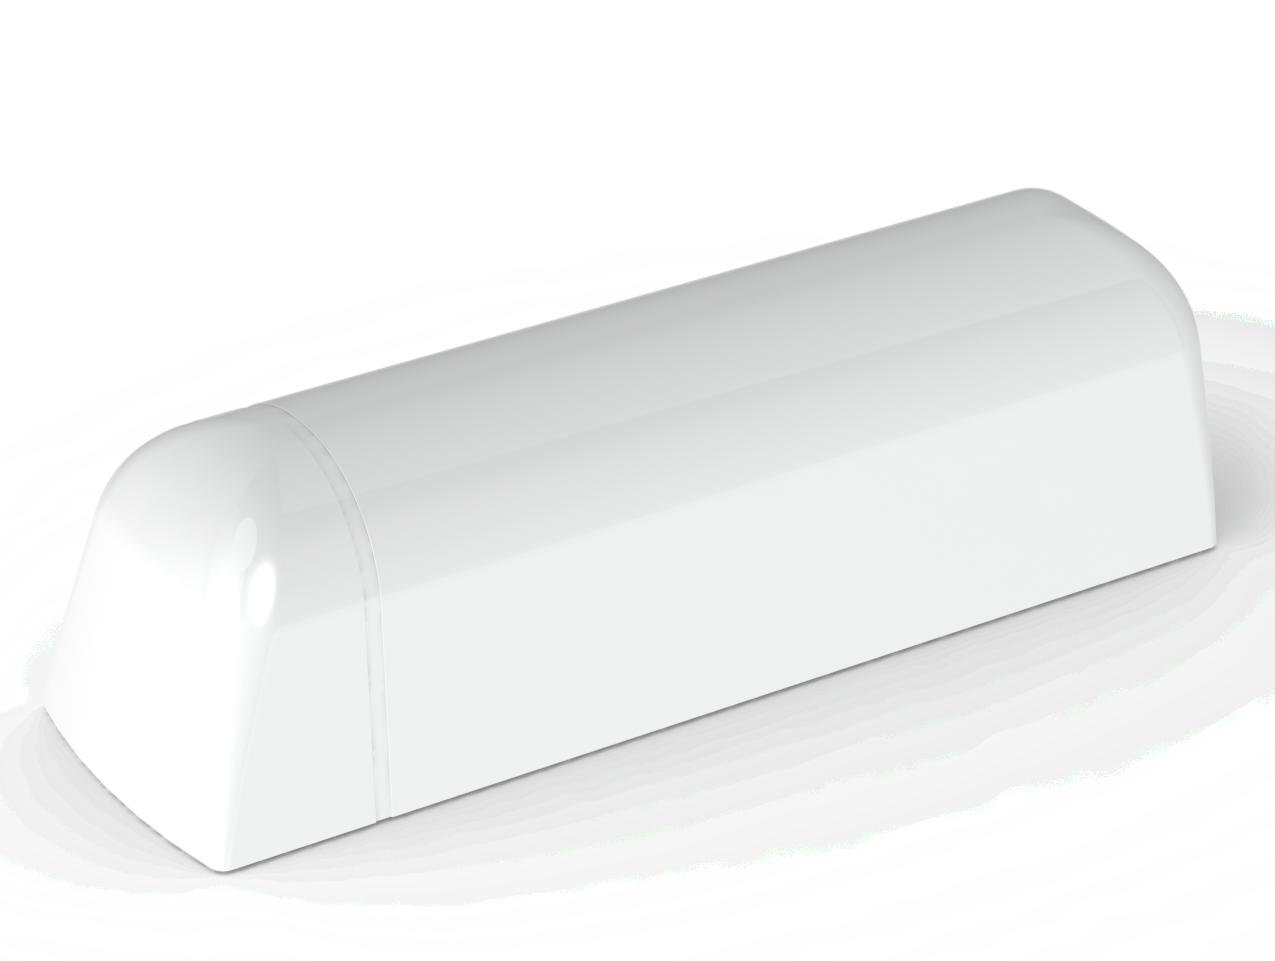 Elsys EMS Desk LoRa sensor | LoRa sensors, Smart building | Product | MCS